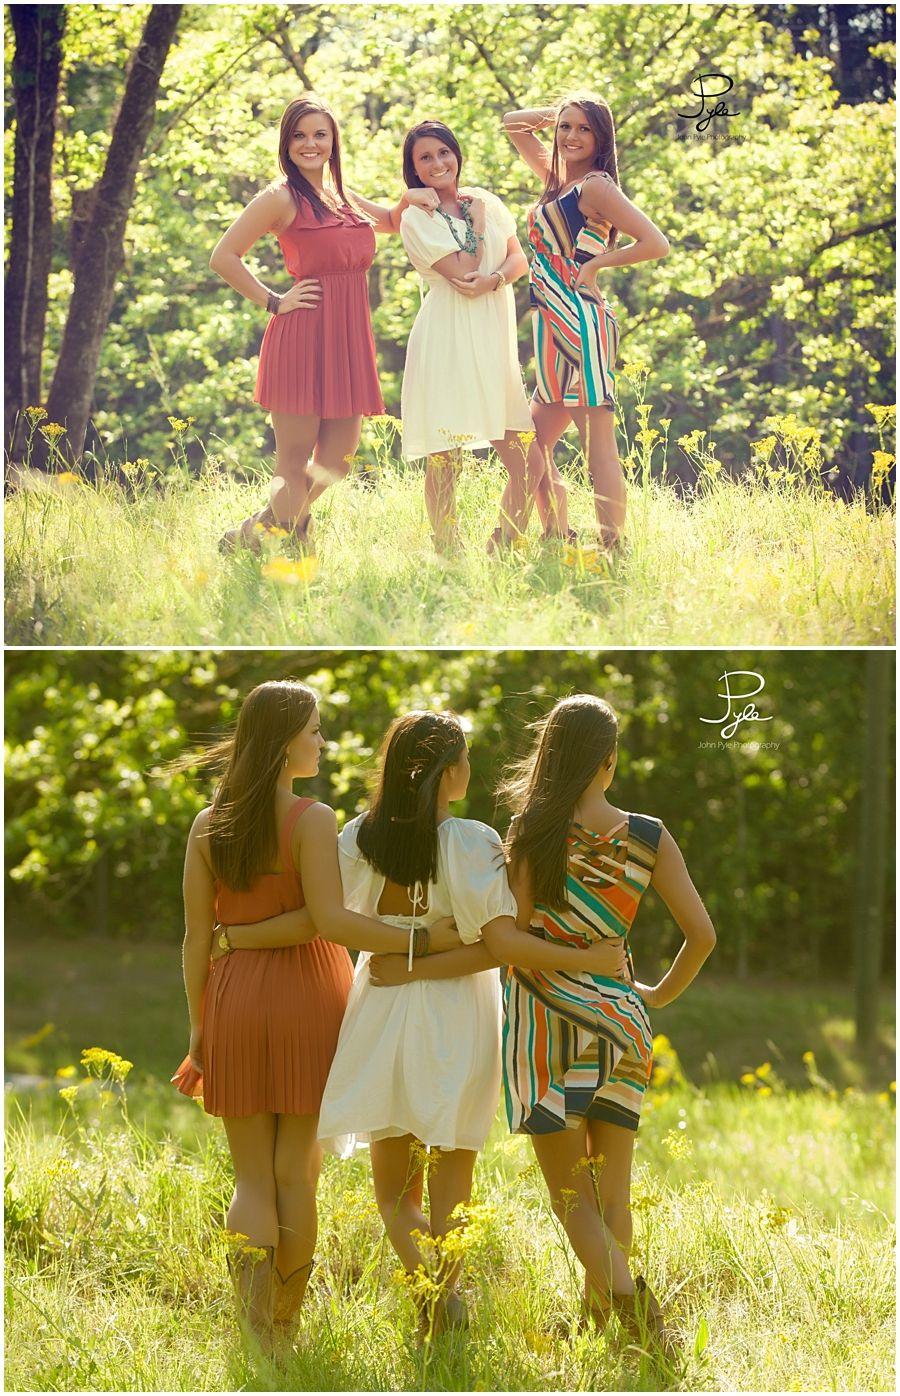 Best Friend Photoshoot Ideas! on Pinterest | Best Friend ...